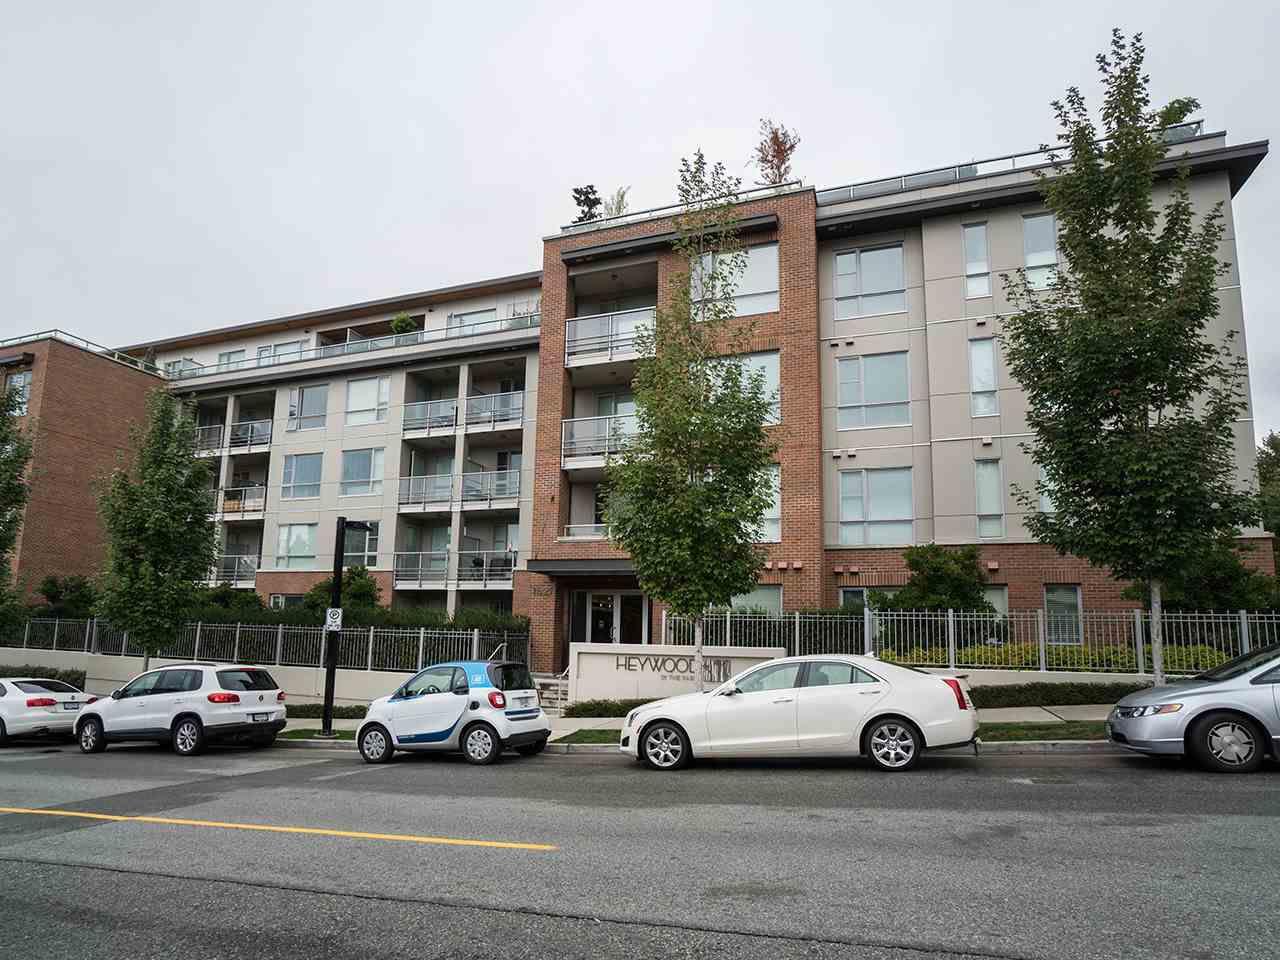 "Main Photo: 313 1621 HAMILTON Avenue in North Vancouver: Hamilton Condo for sale in ""Heywood on the Park"" : MLS®# R2209661"